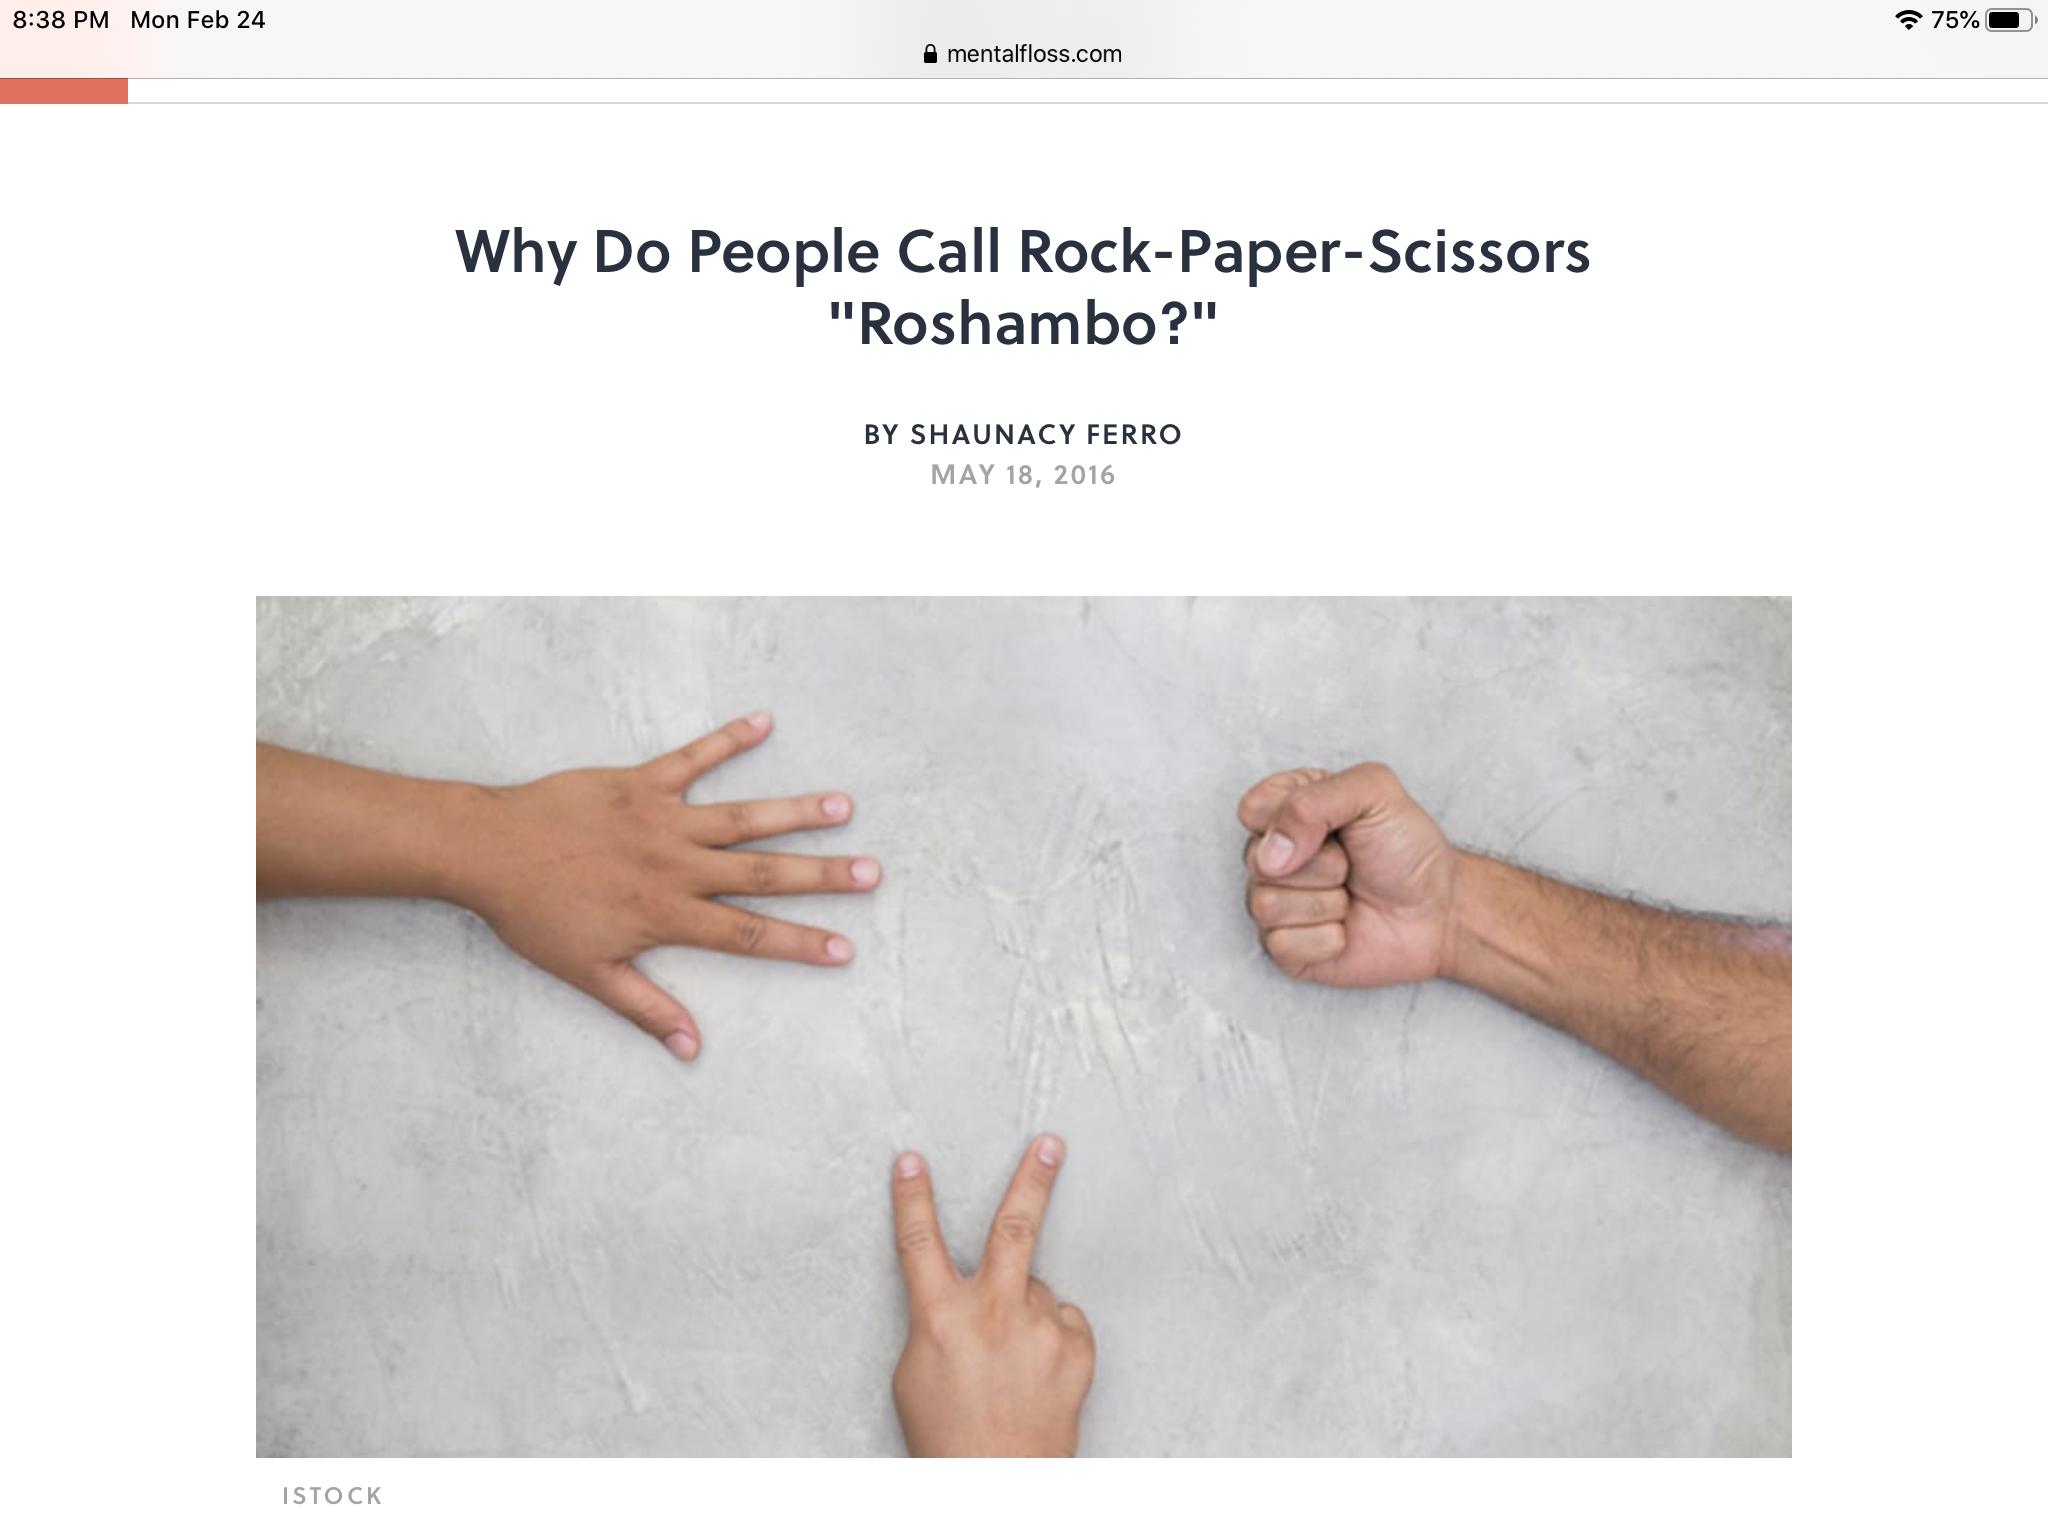 Rock, Paper, Scissors, stein papier, scherer, Rochambeau, roshambo